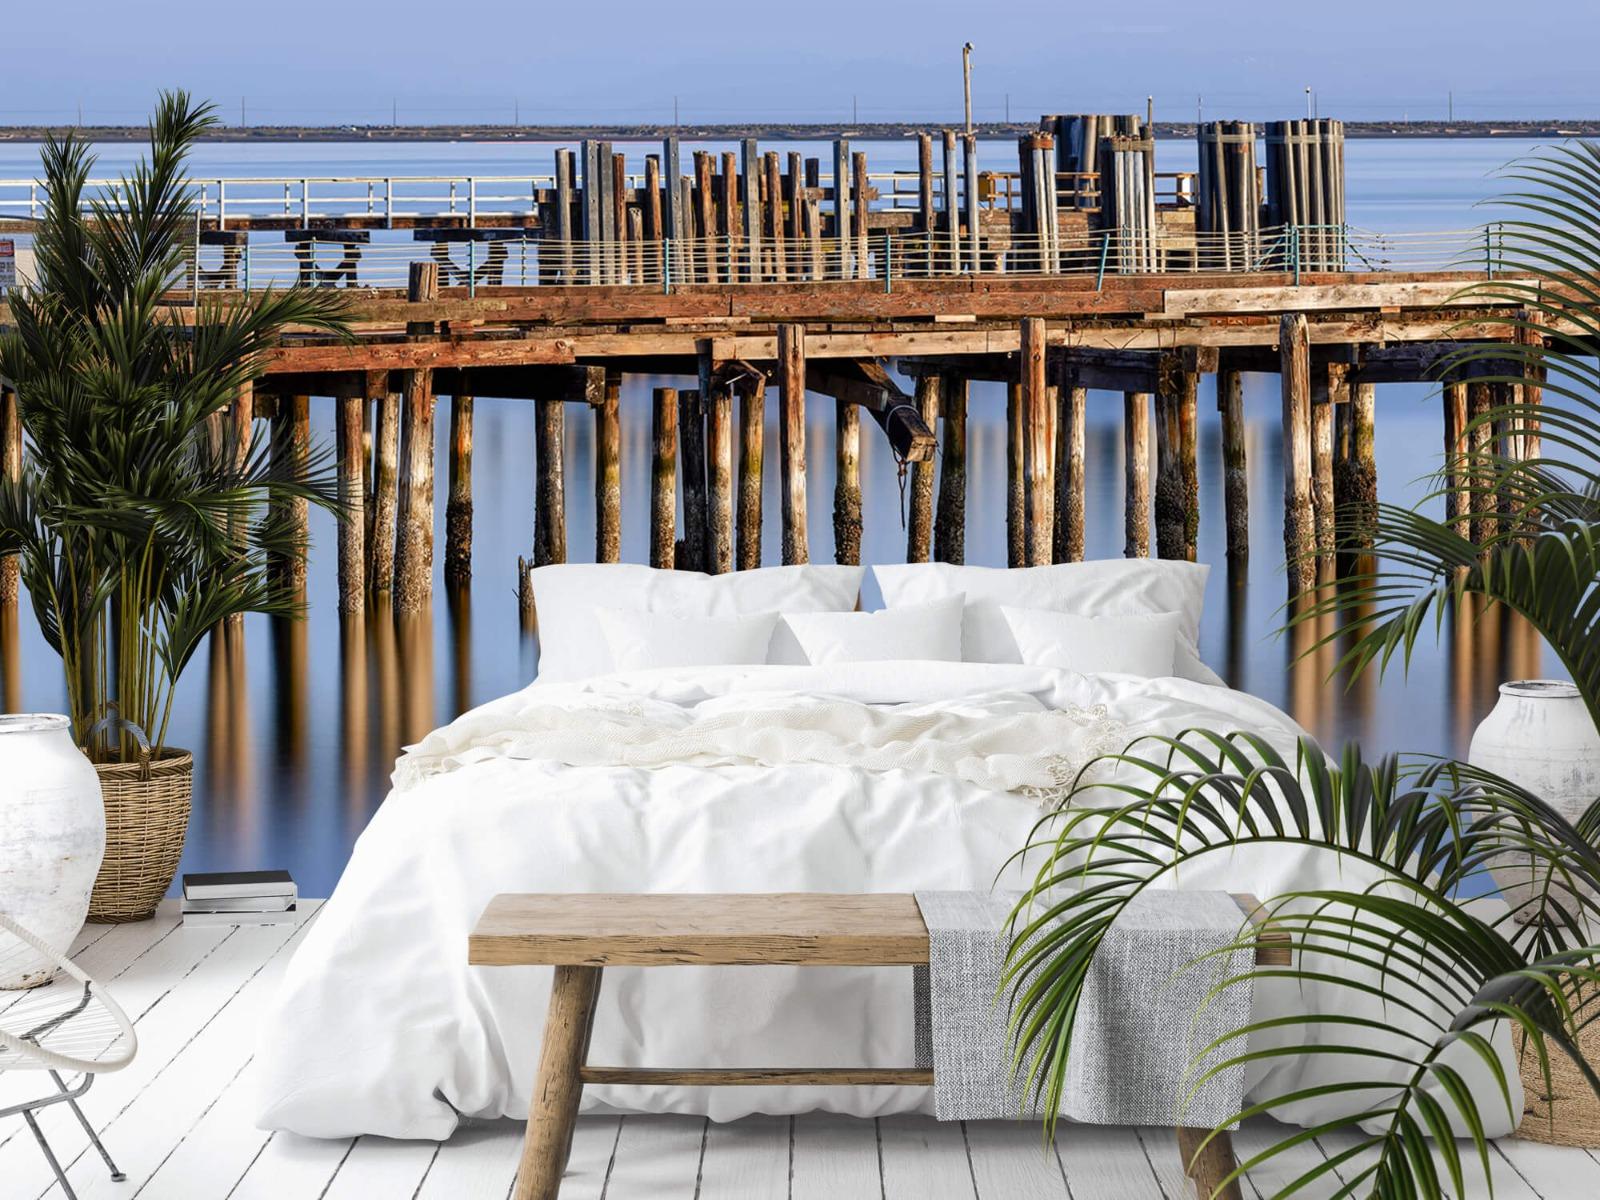 Houten Steigers - Steiger op houten palen - Wallexclusive - Slaapkamer 14